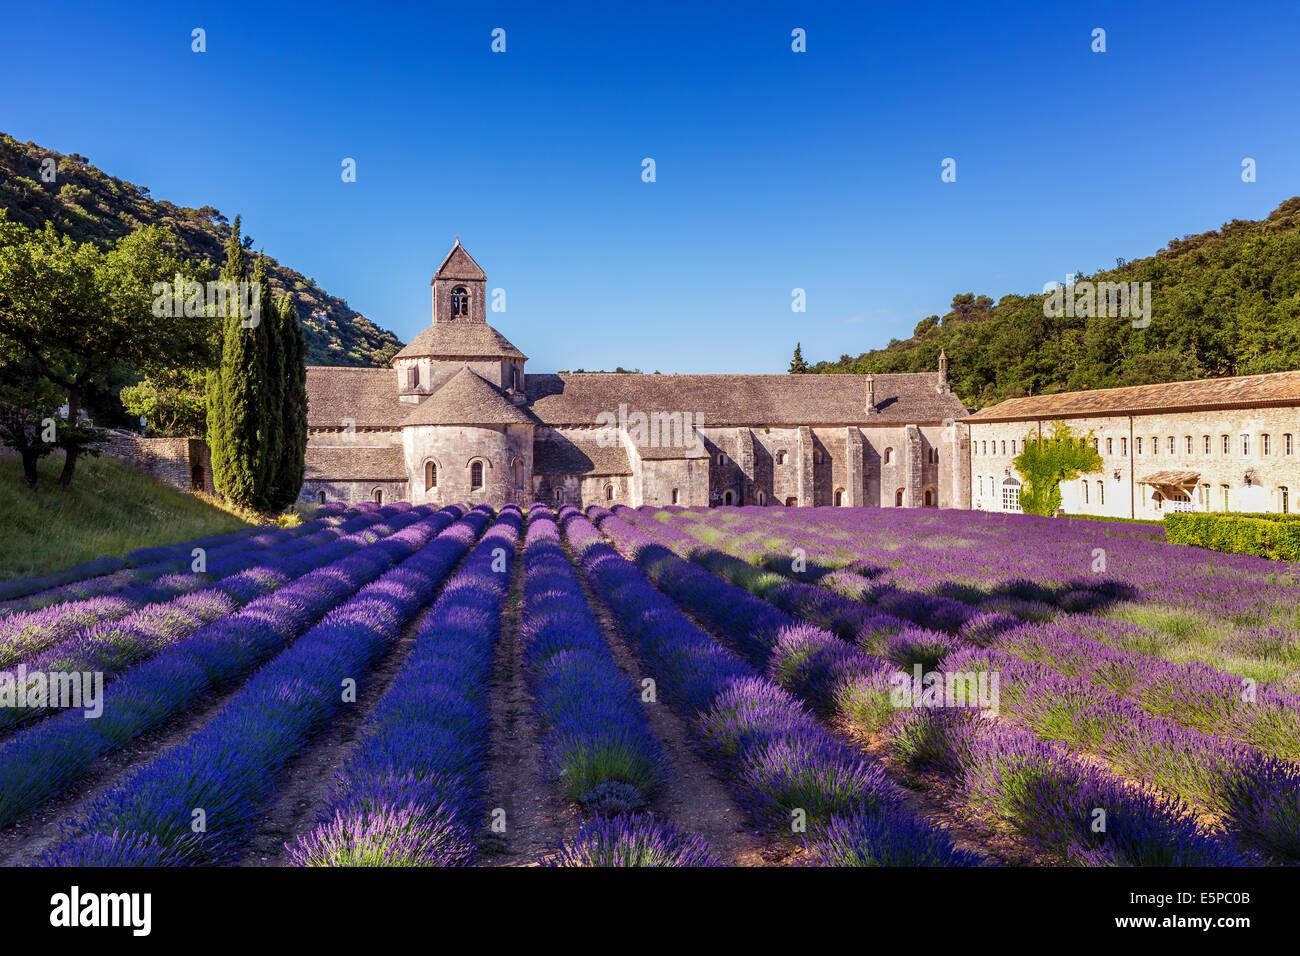 The Romanesque Cistercian Abbey of Notre Dame of Senanque set amongst flowering lavender fields, near Gordes, Provence, - Stock Image